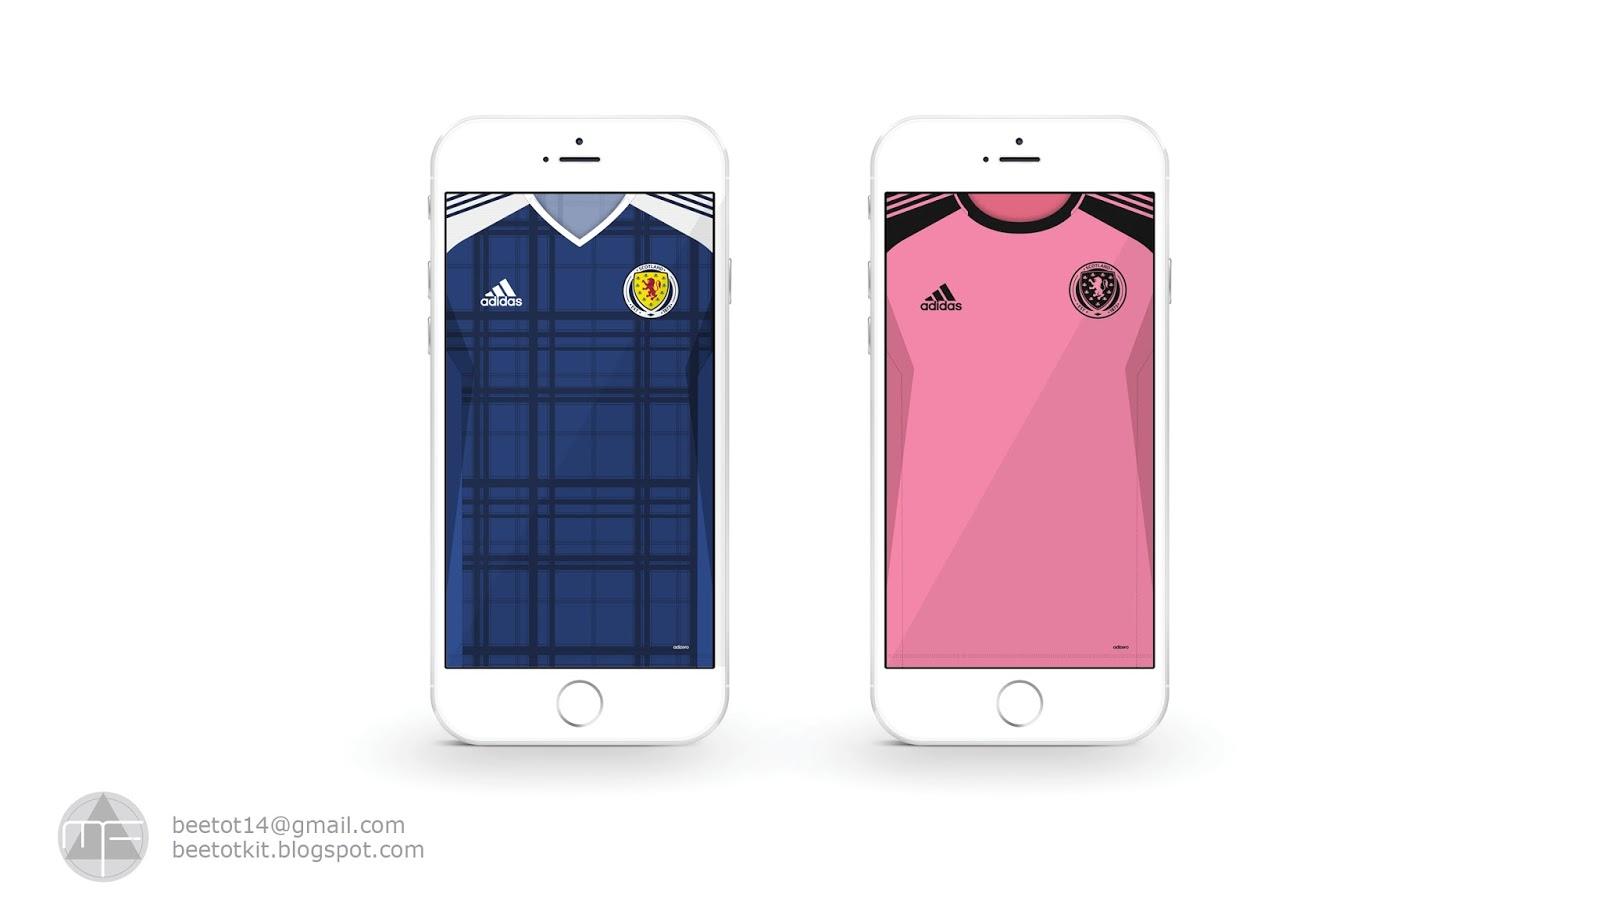 Beetot kit scotland kit 2016 iphone 6 wallpaper for Wallpaper home 2016